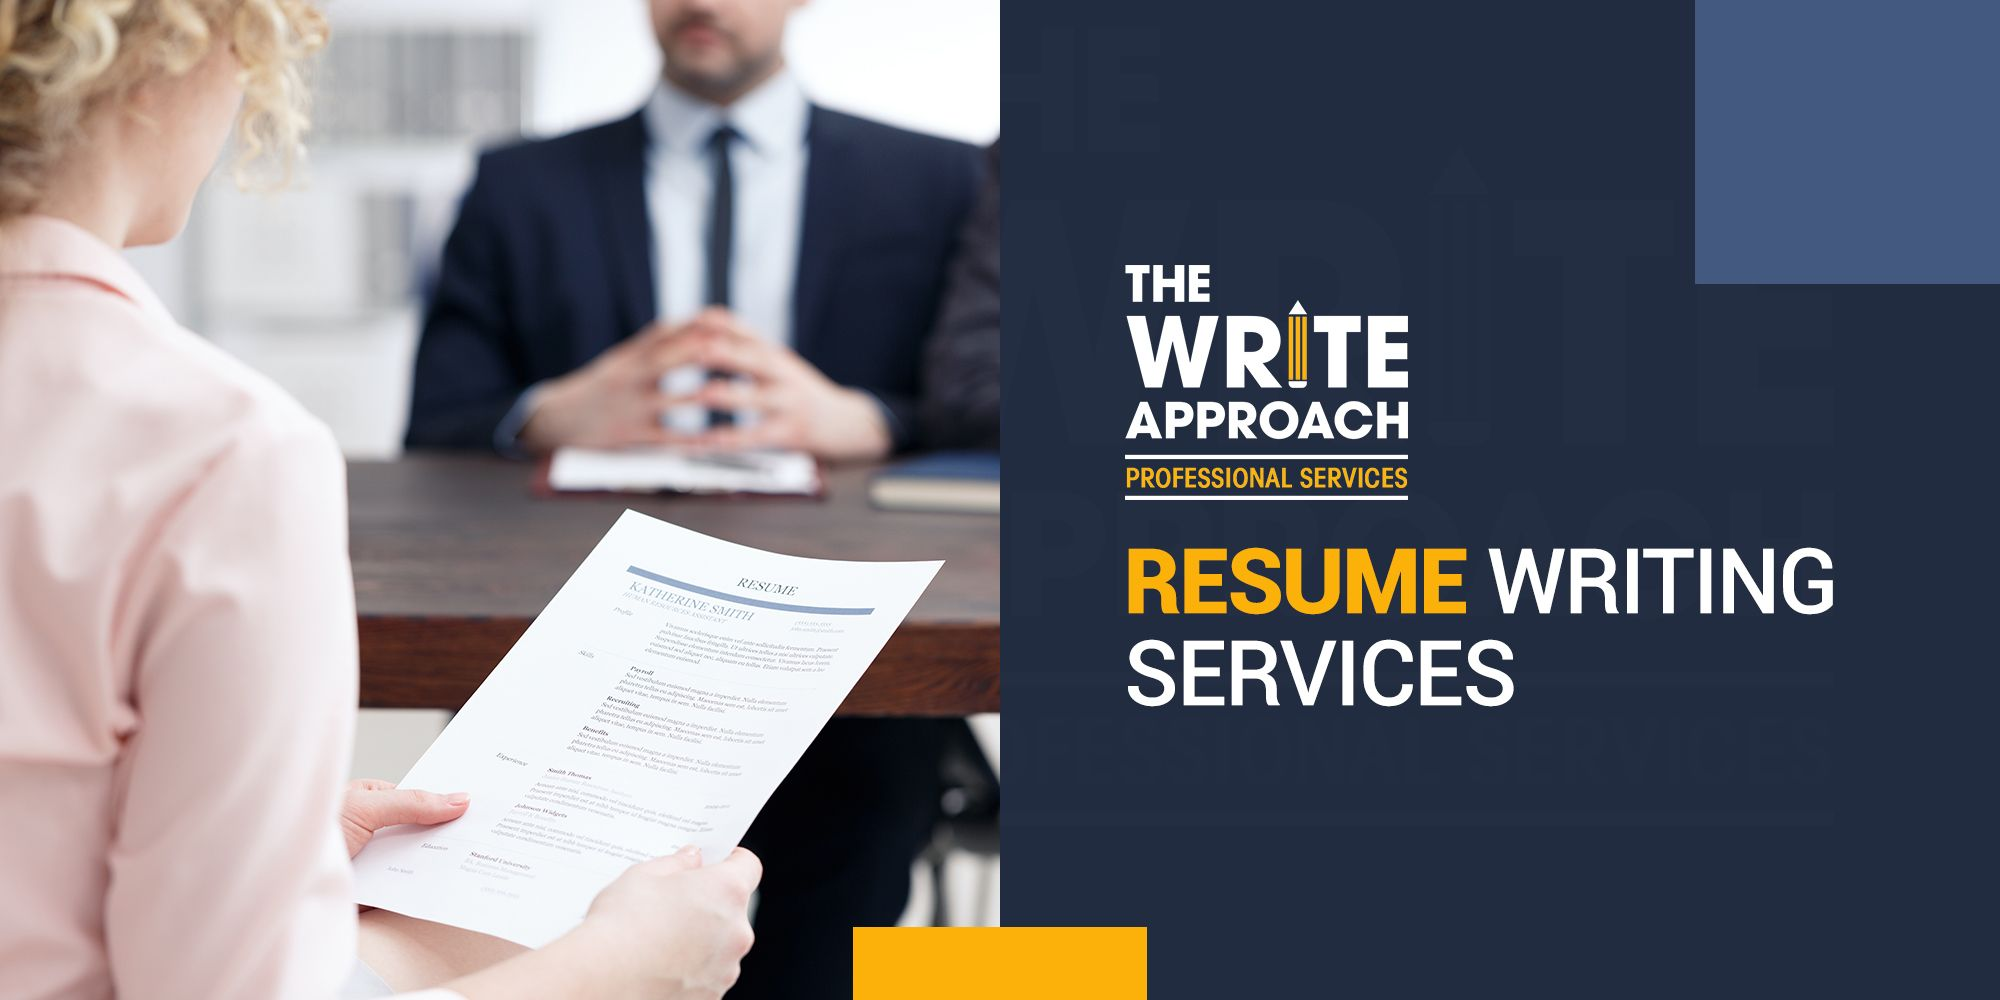 Toronto Resume Writing Service Resume writing services